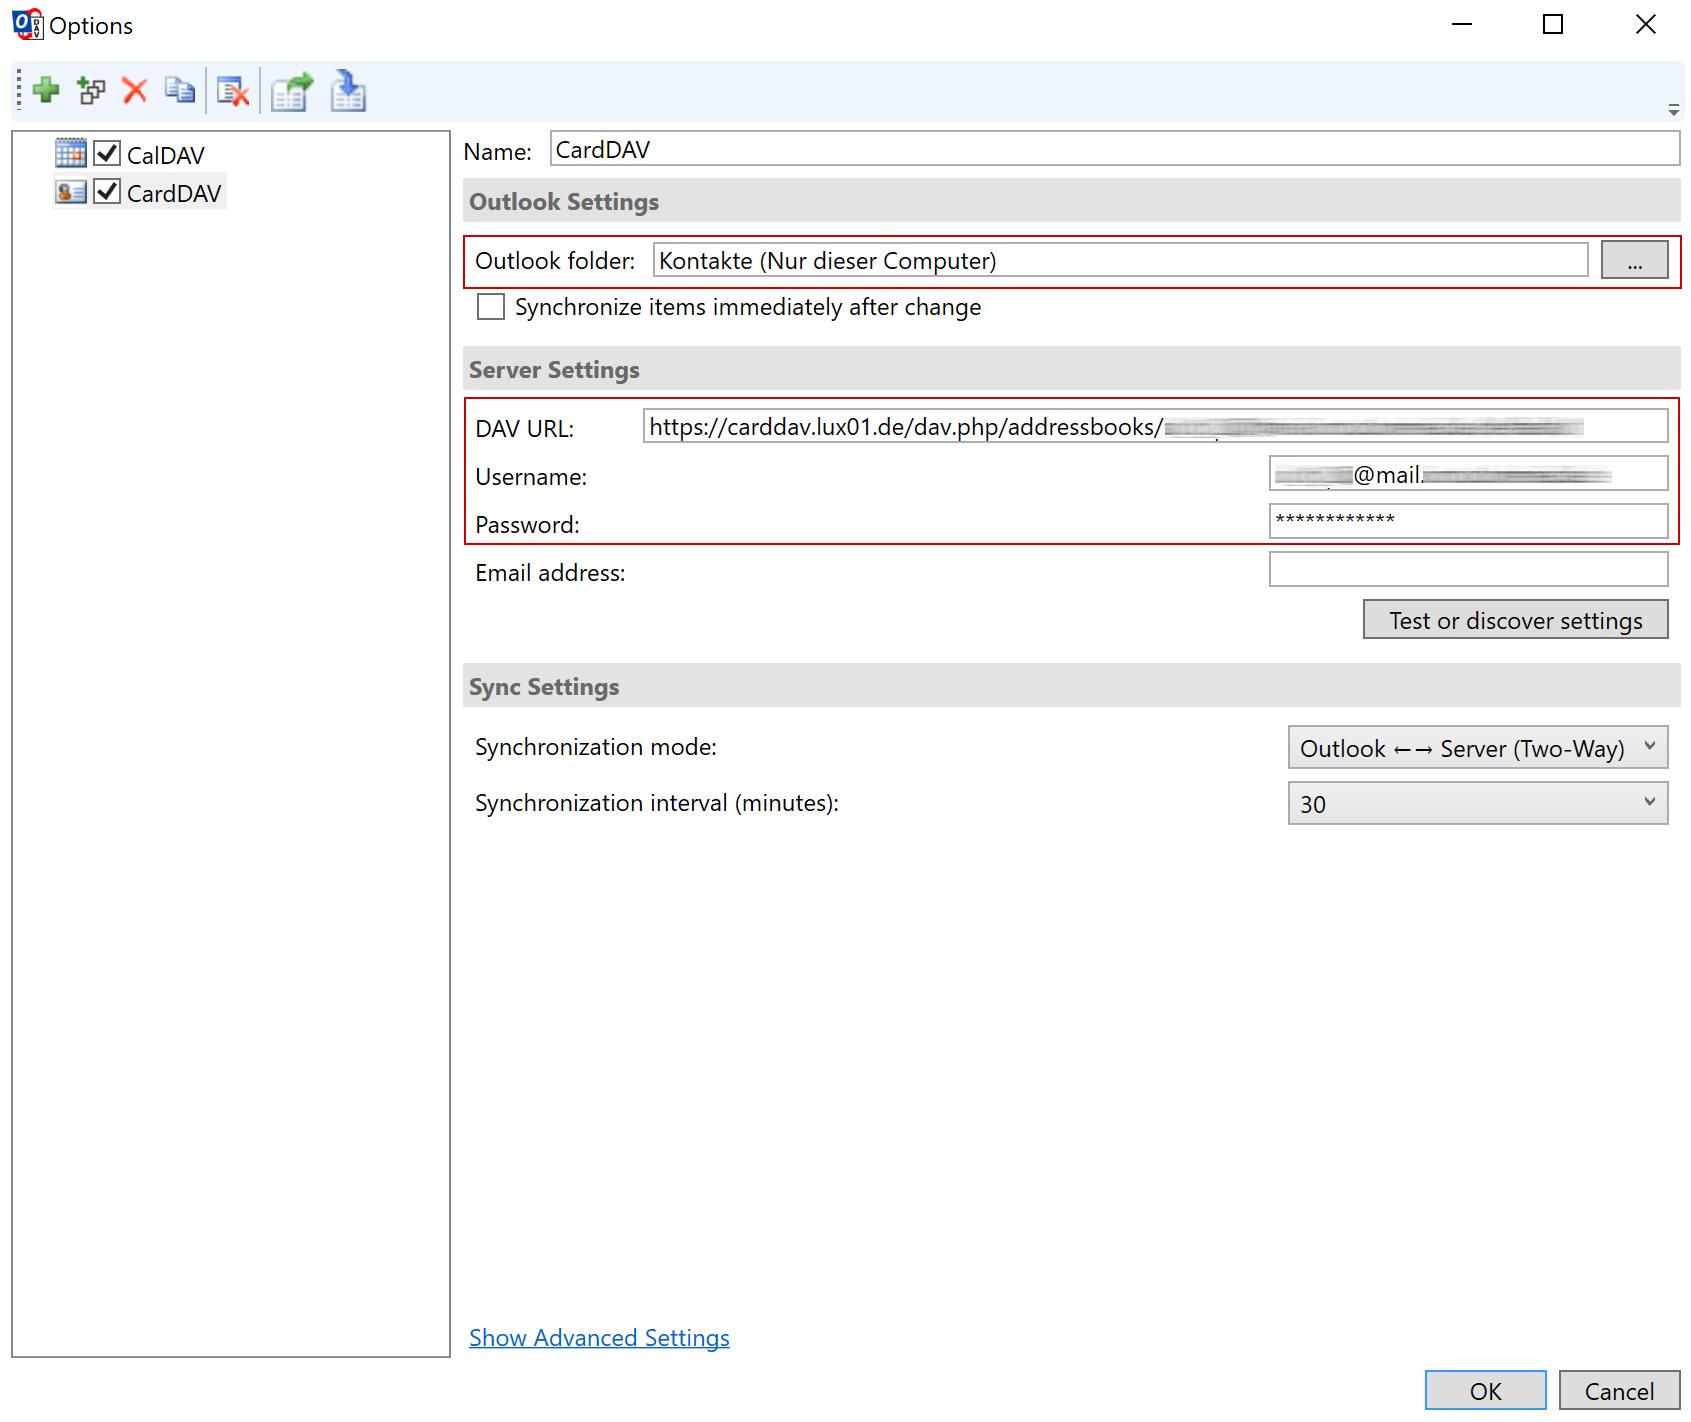 CardDAV via Outlook - 5